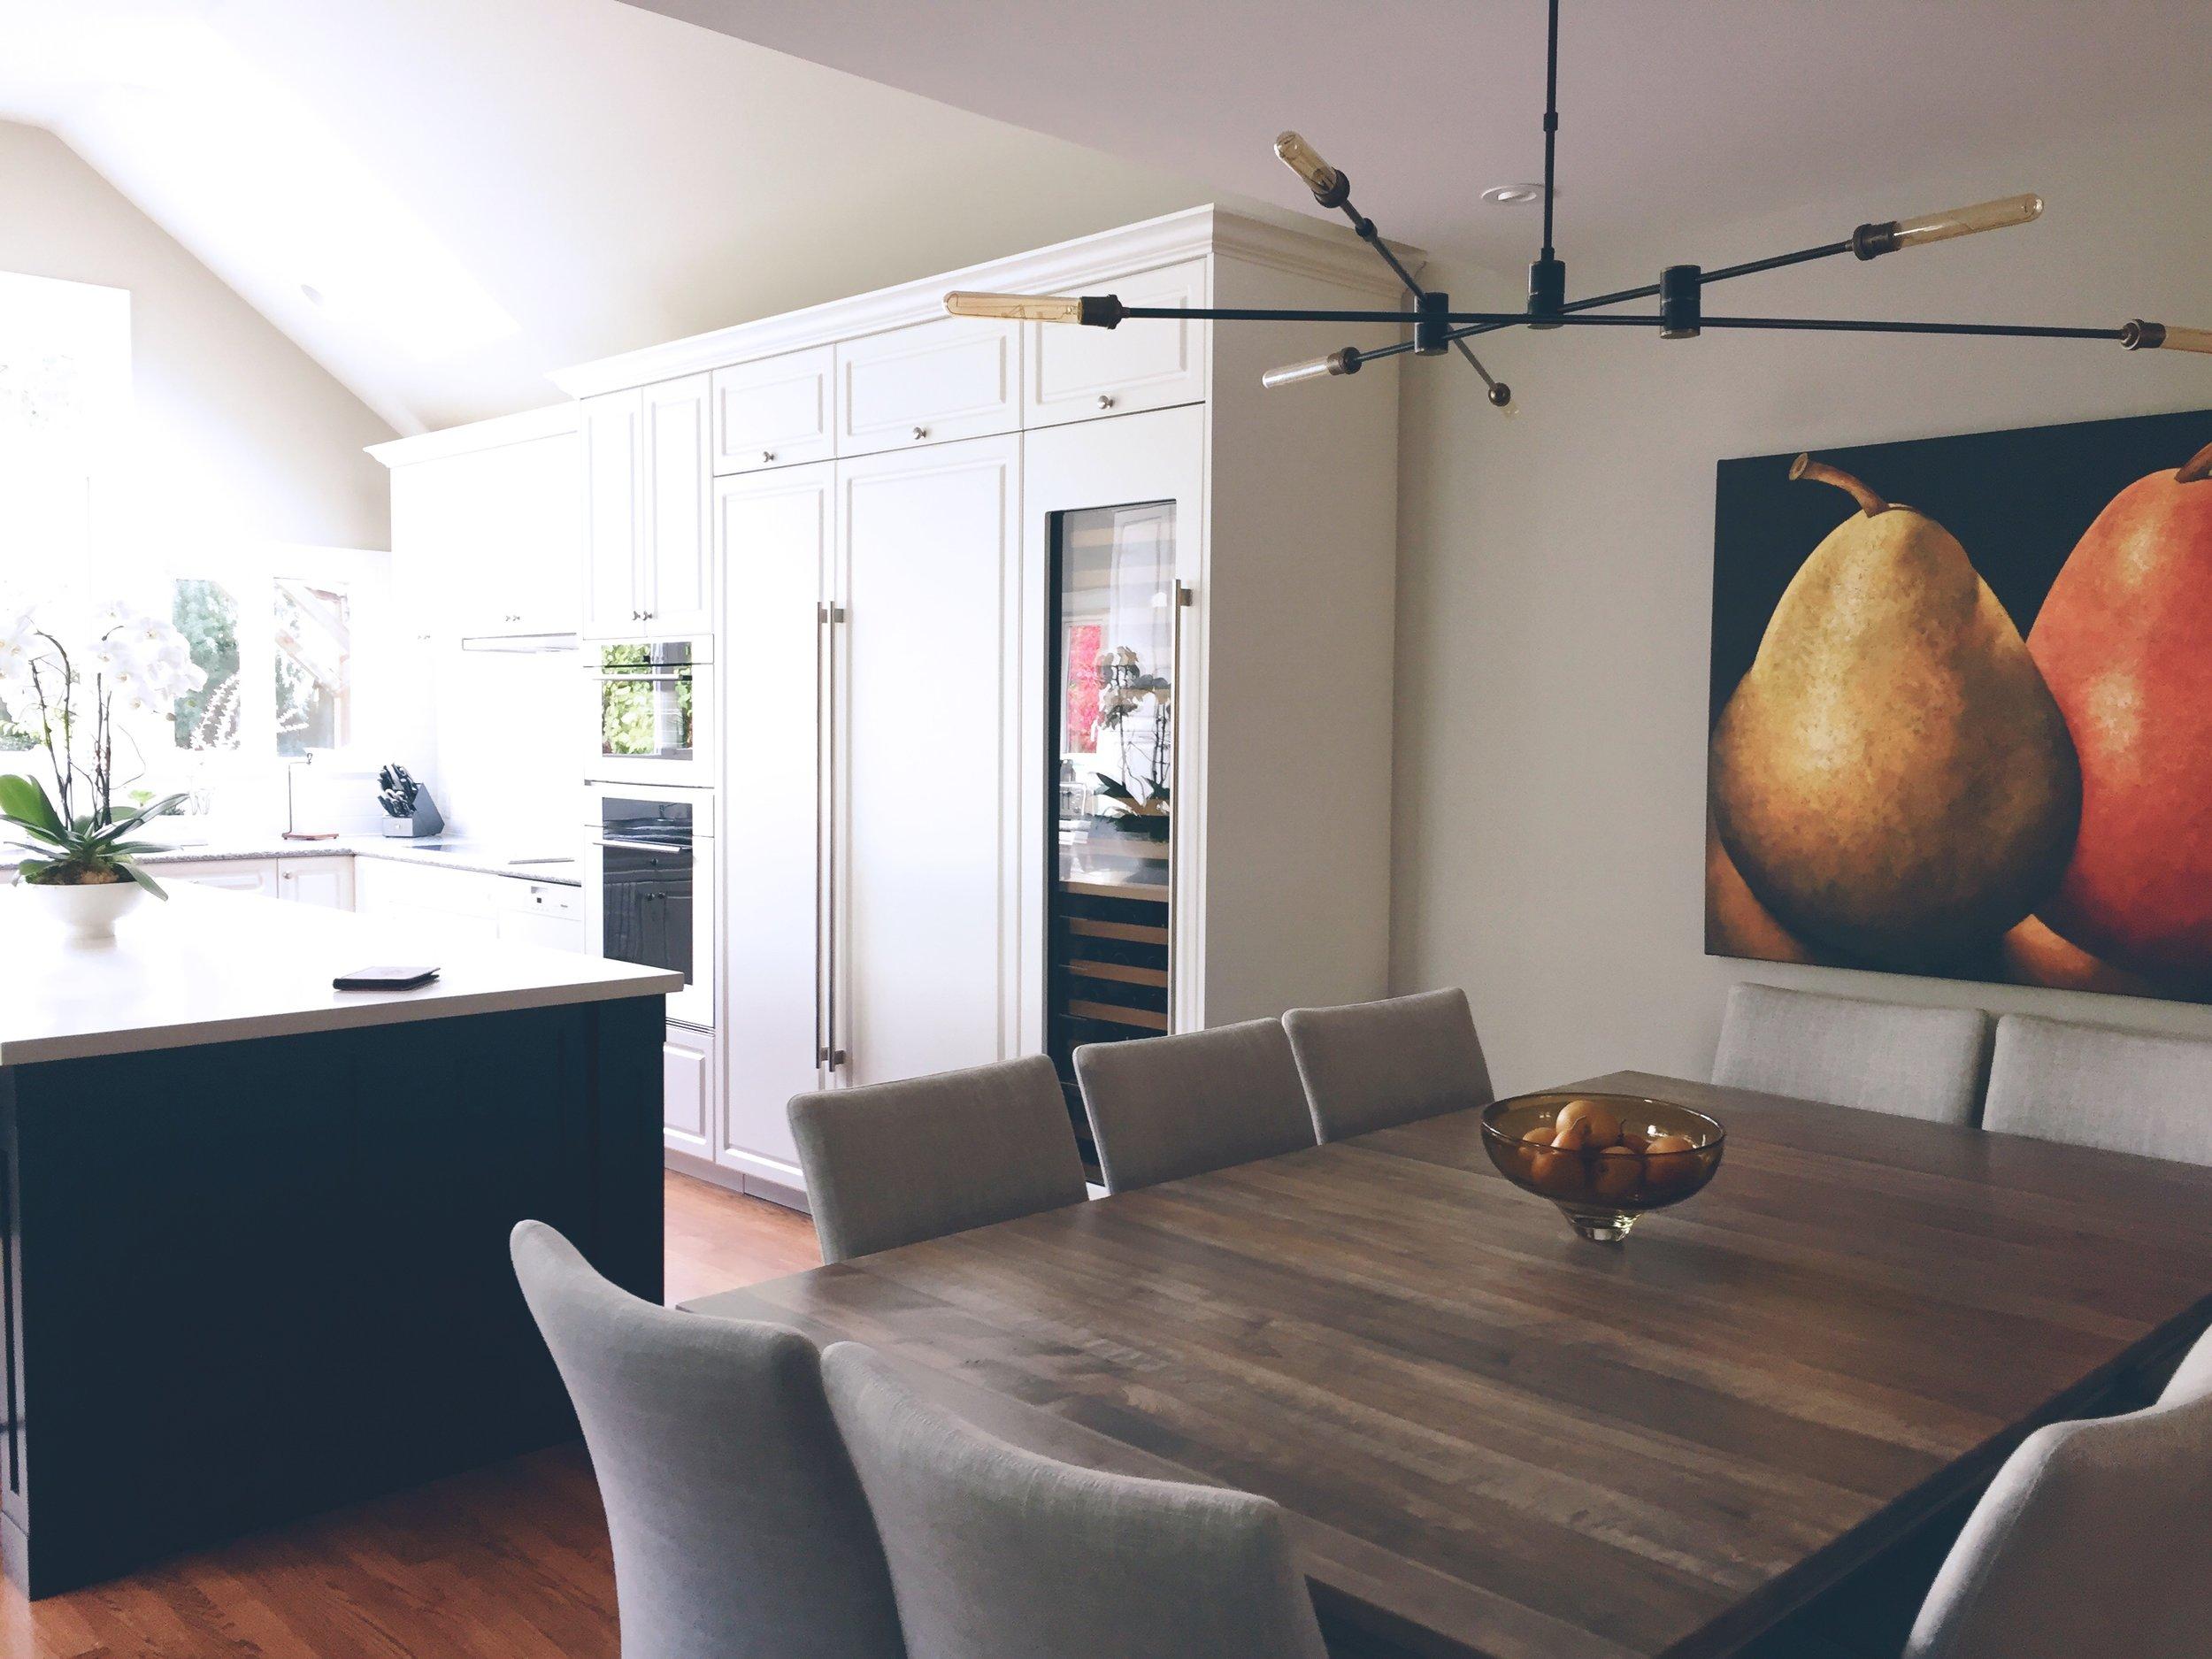 Dunbar kitchen_family room update.jpg